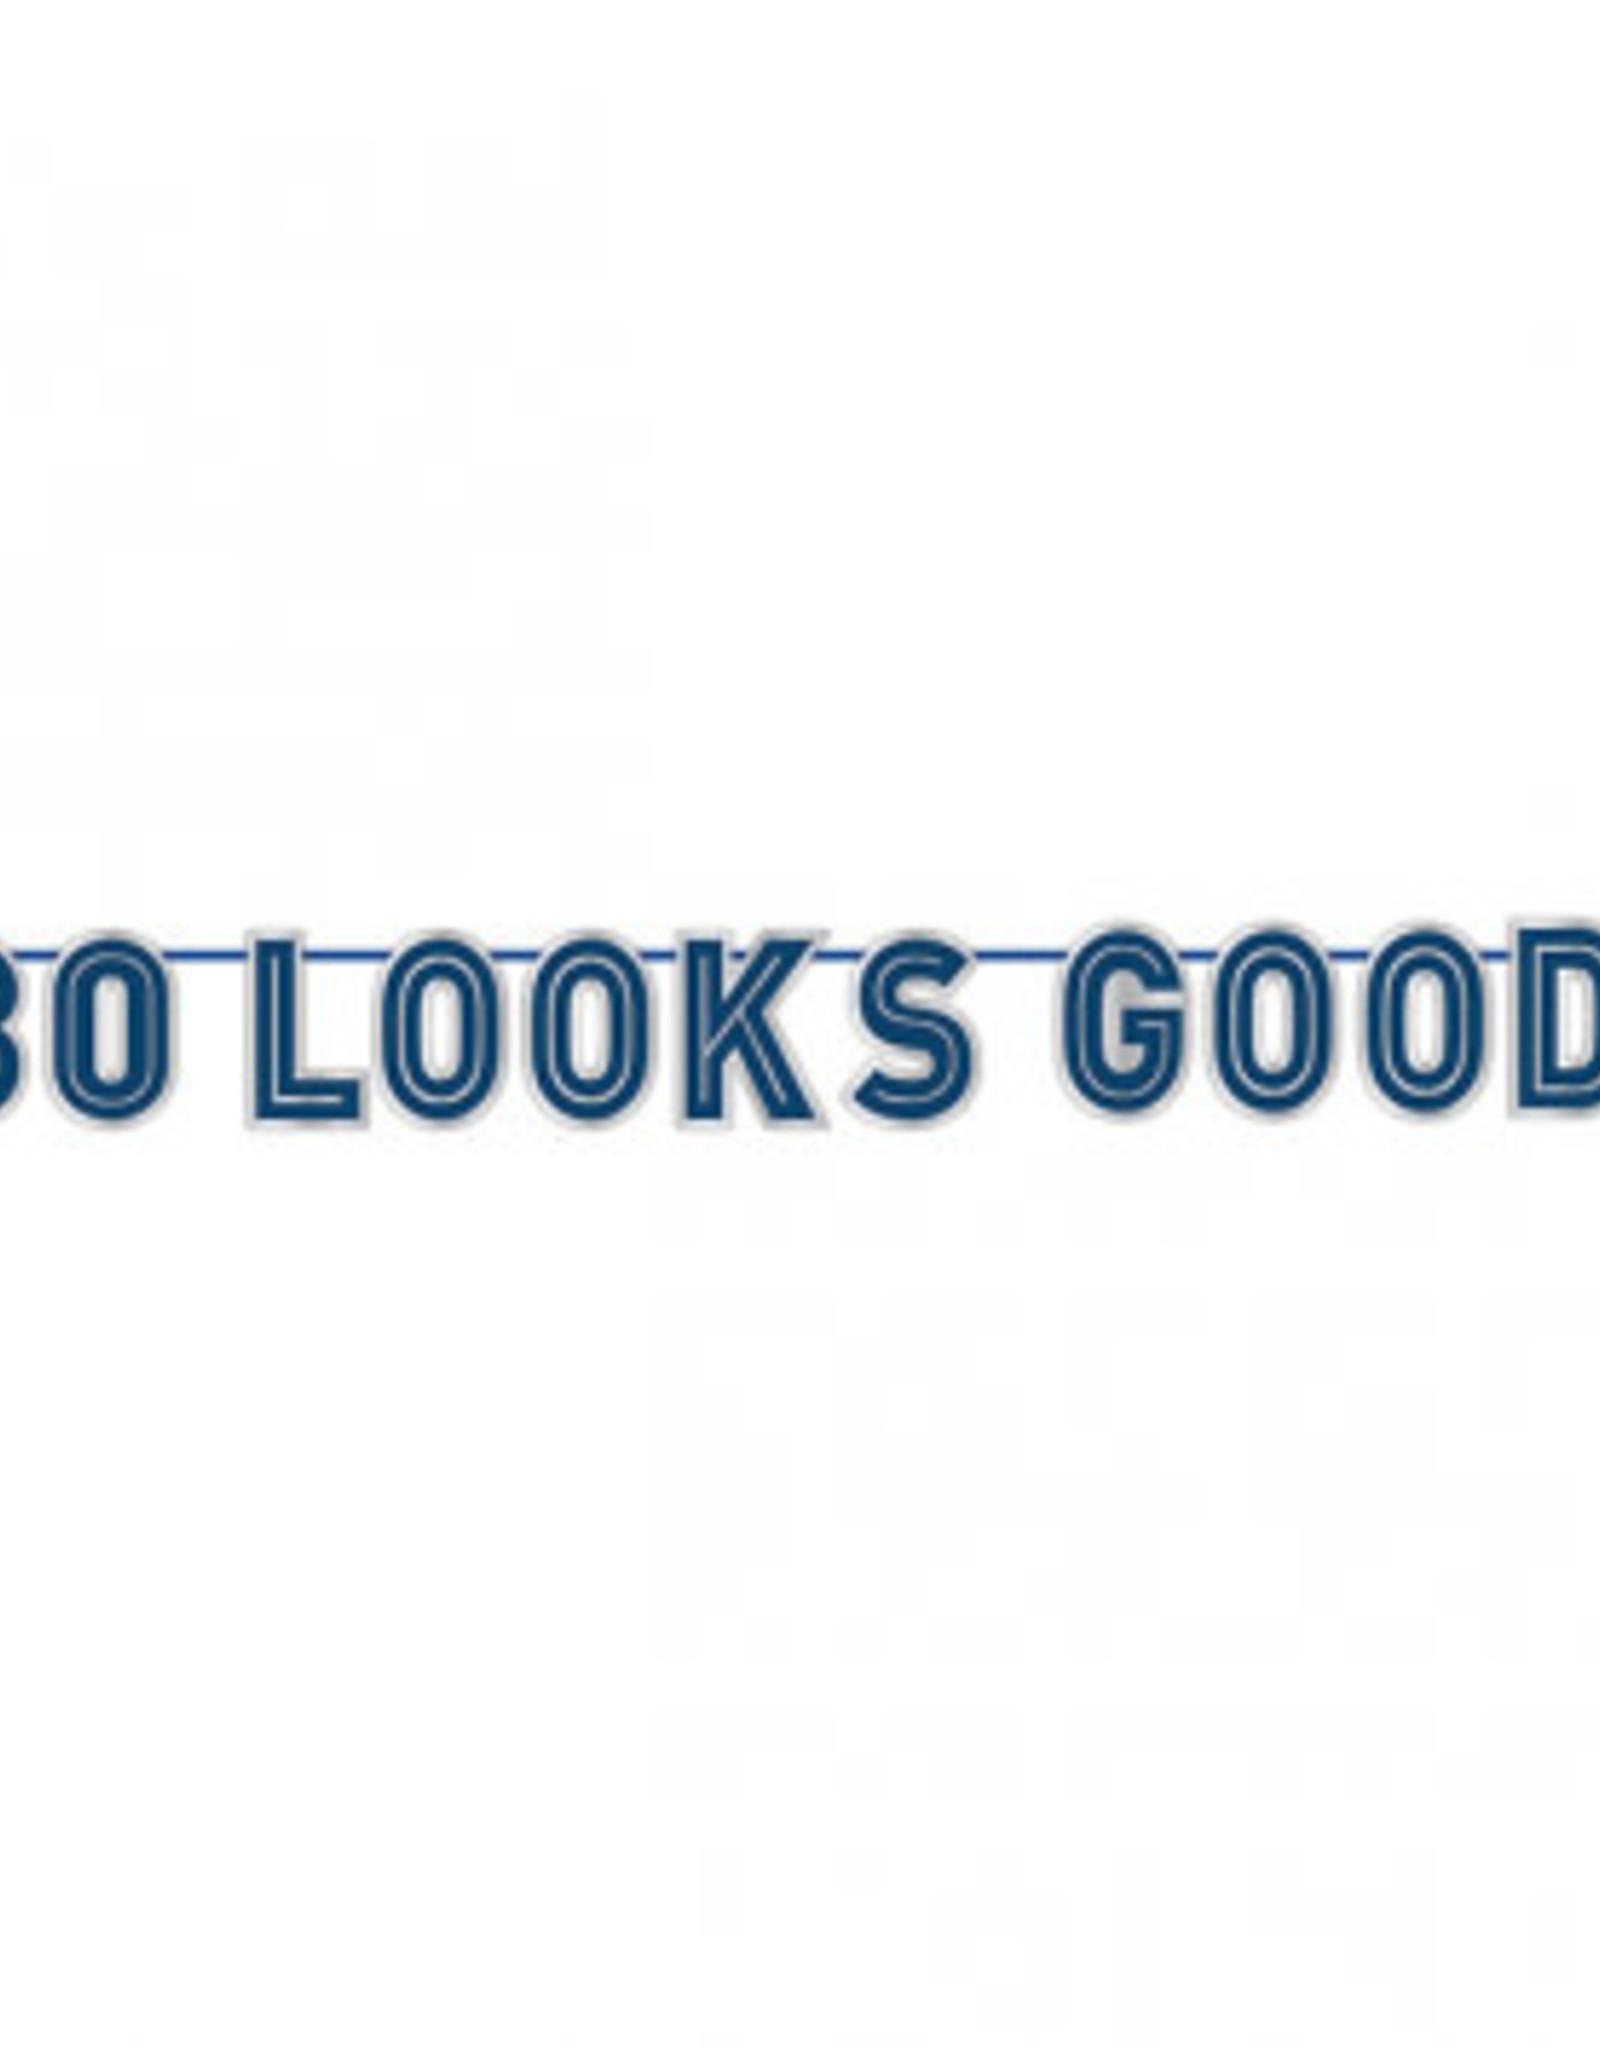 '30 Looks Good!' 30th Birthday Banner